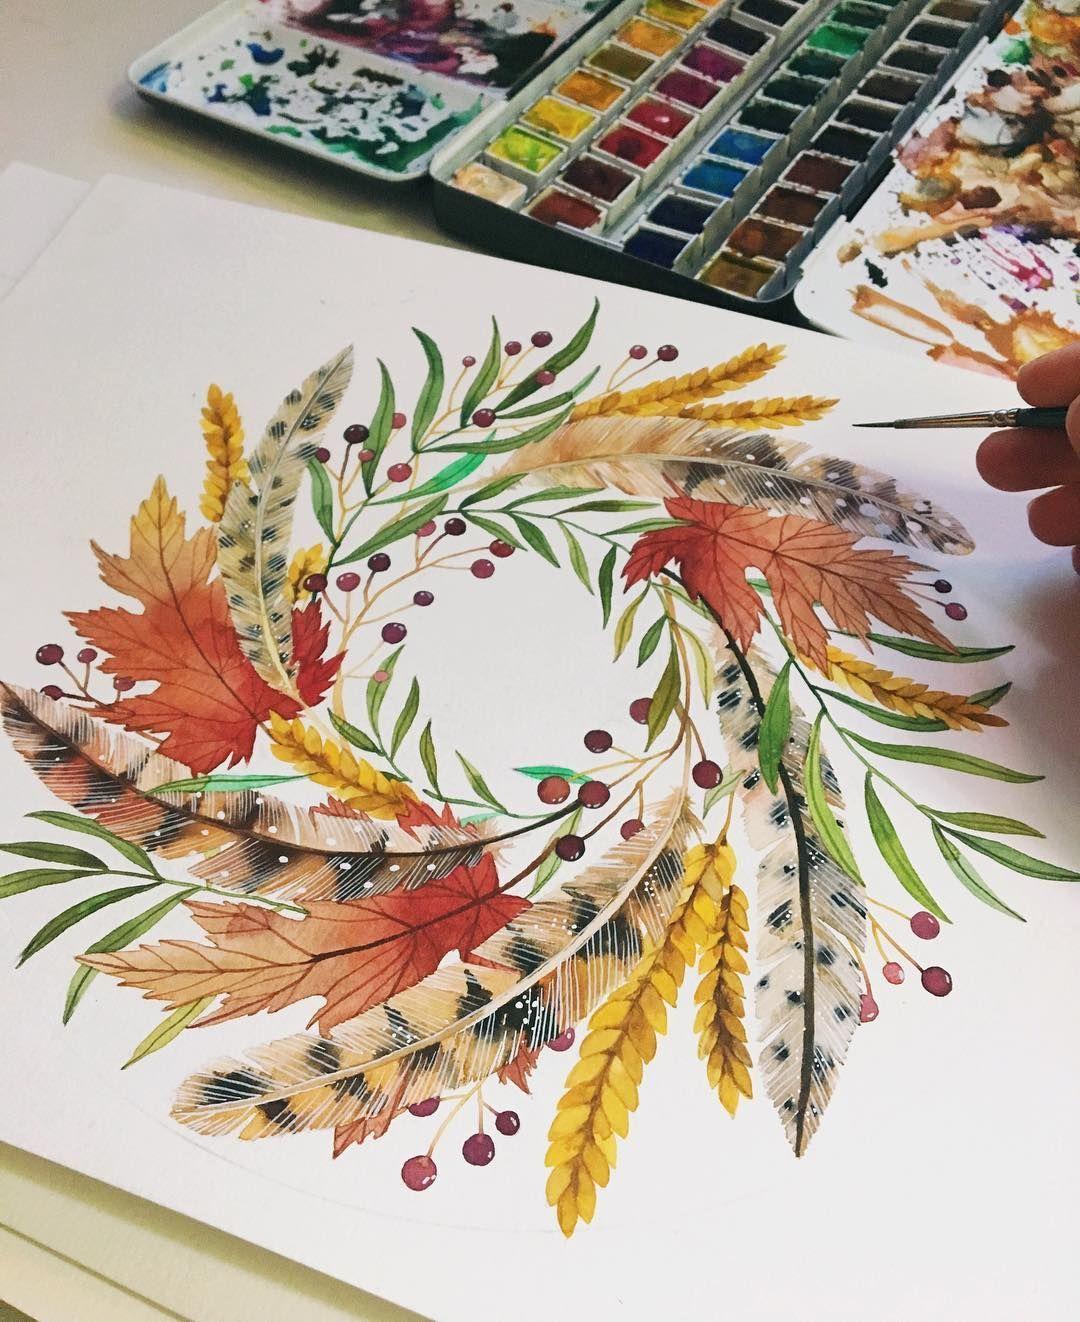 Pin By Pat Marun On Art Botanical Floral Art Fauna Illustration Botanical Illustration